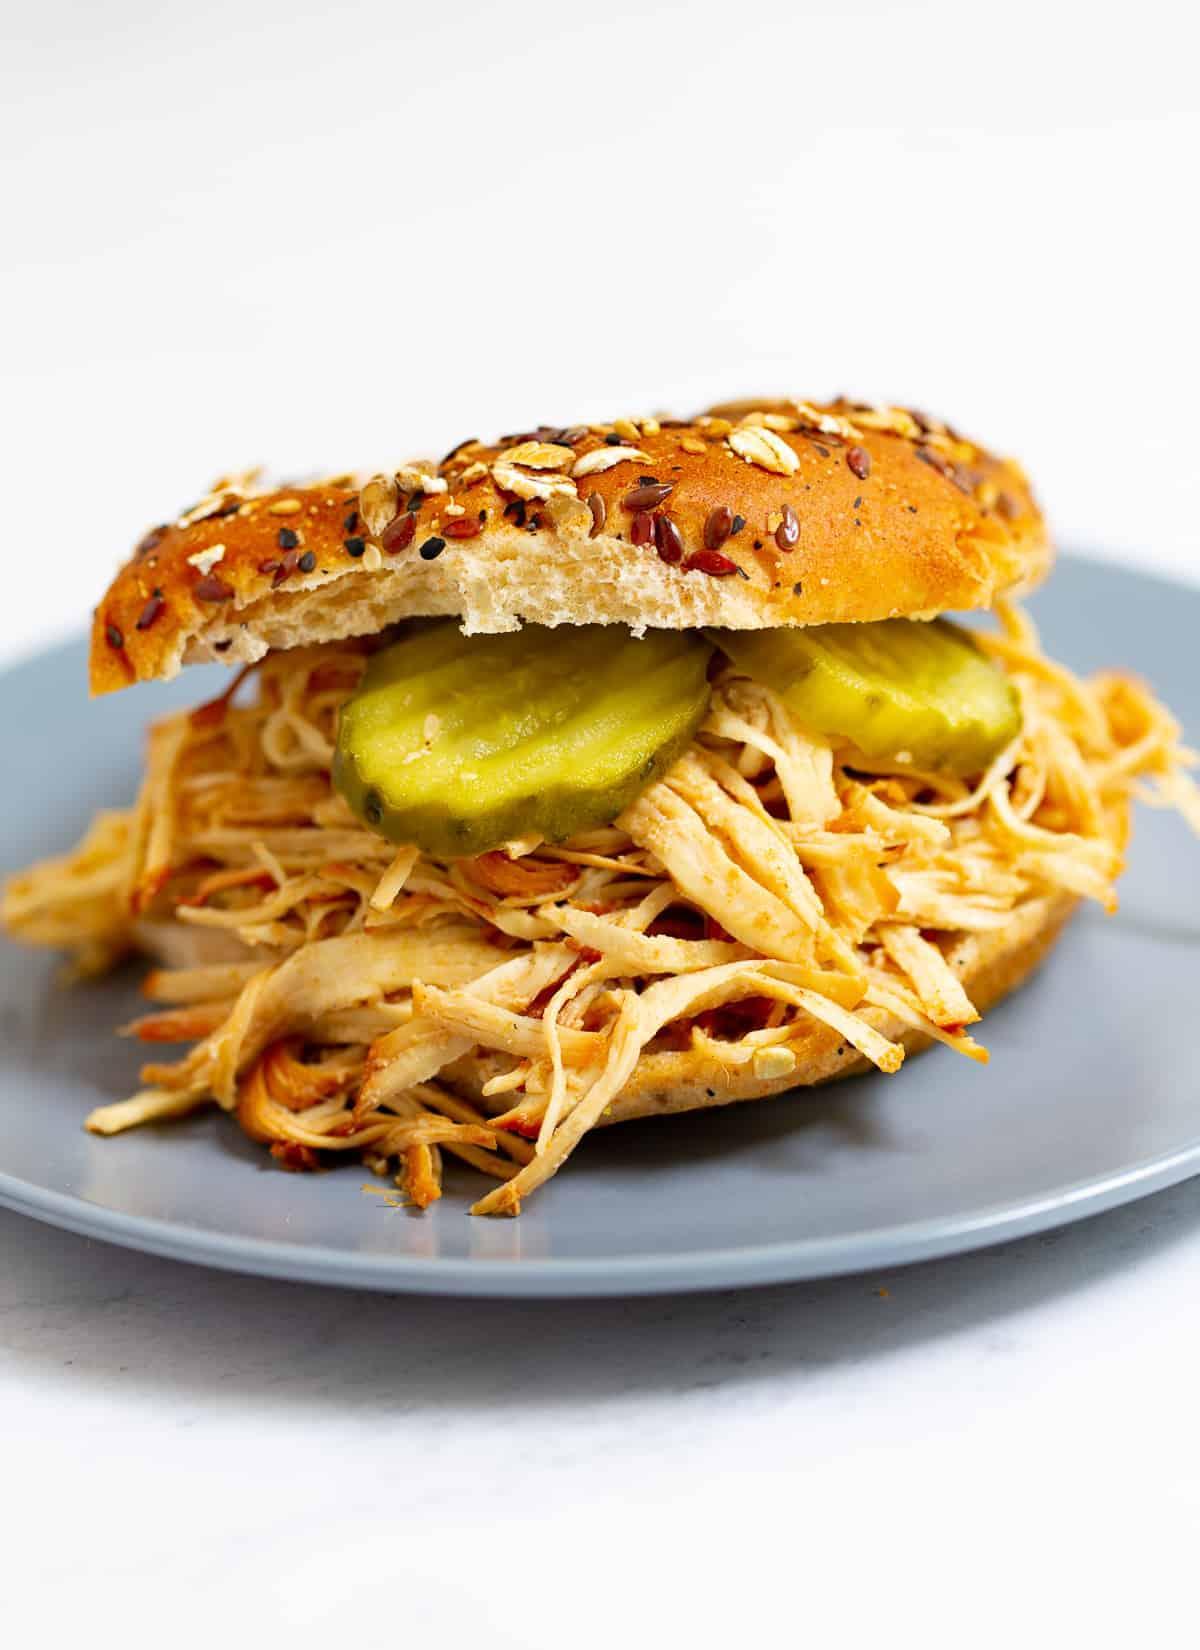 Instant Pot Pulled BBQ Chicken sandwich Recipe